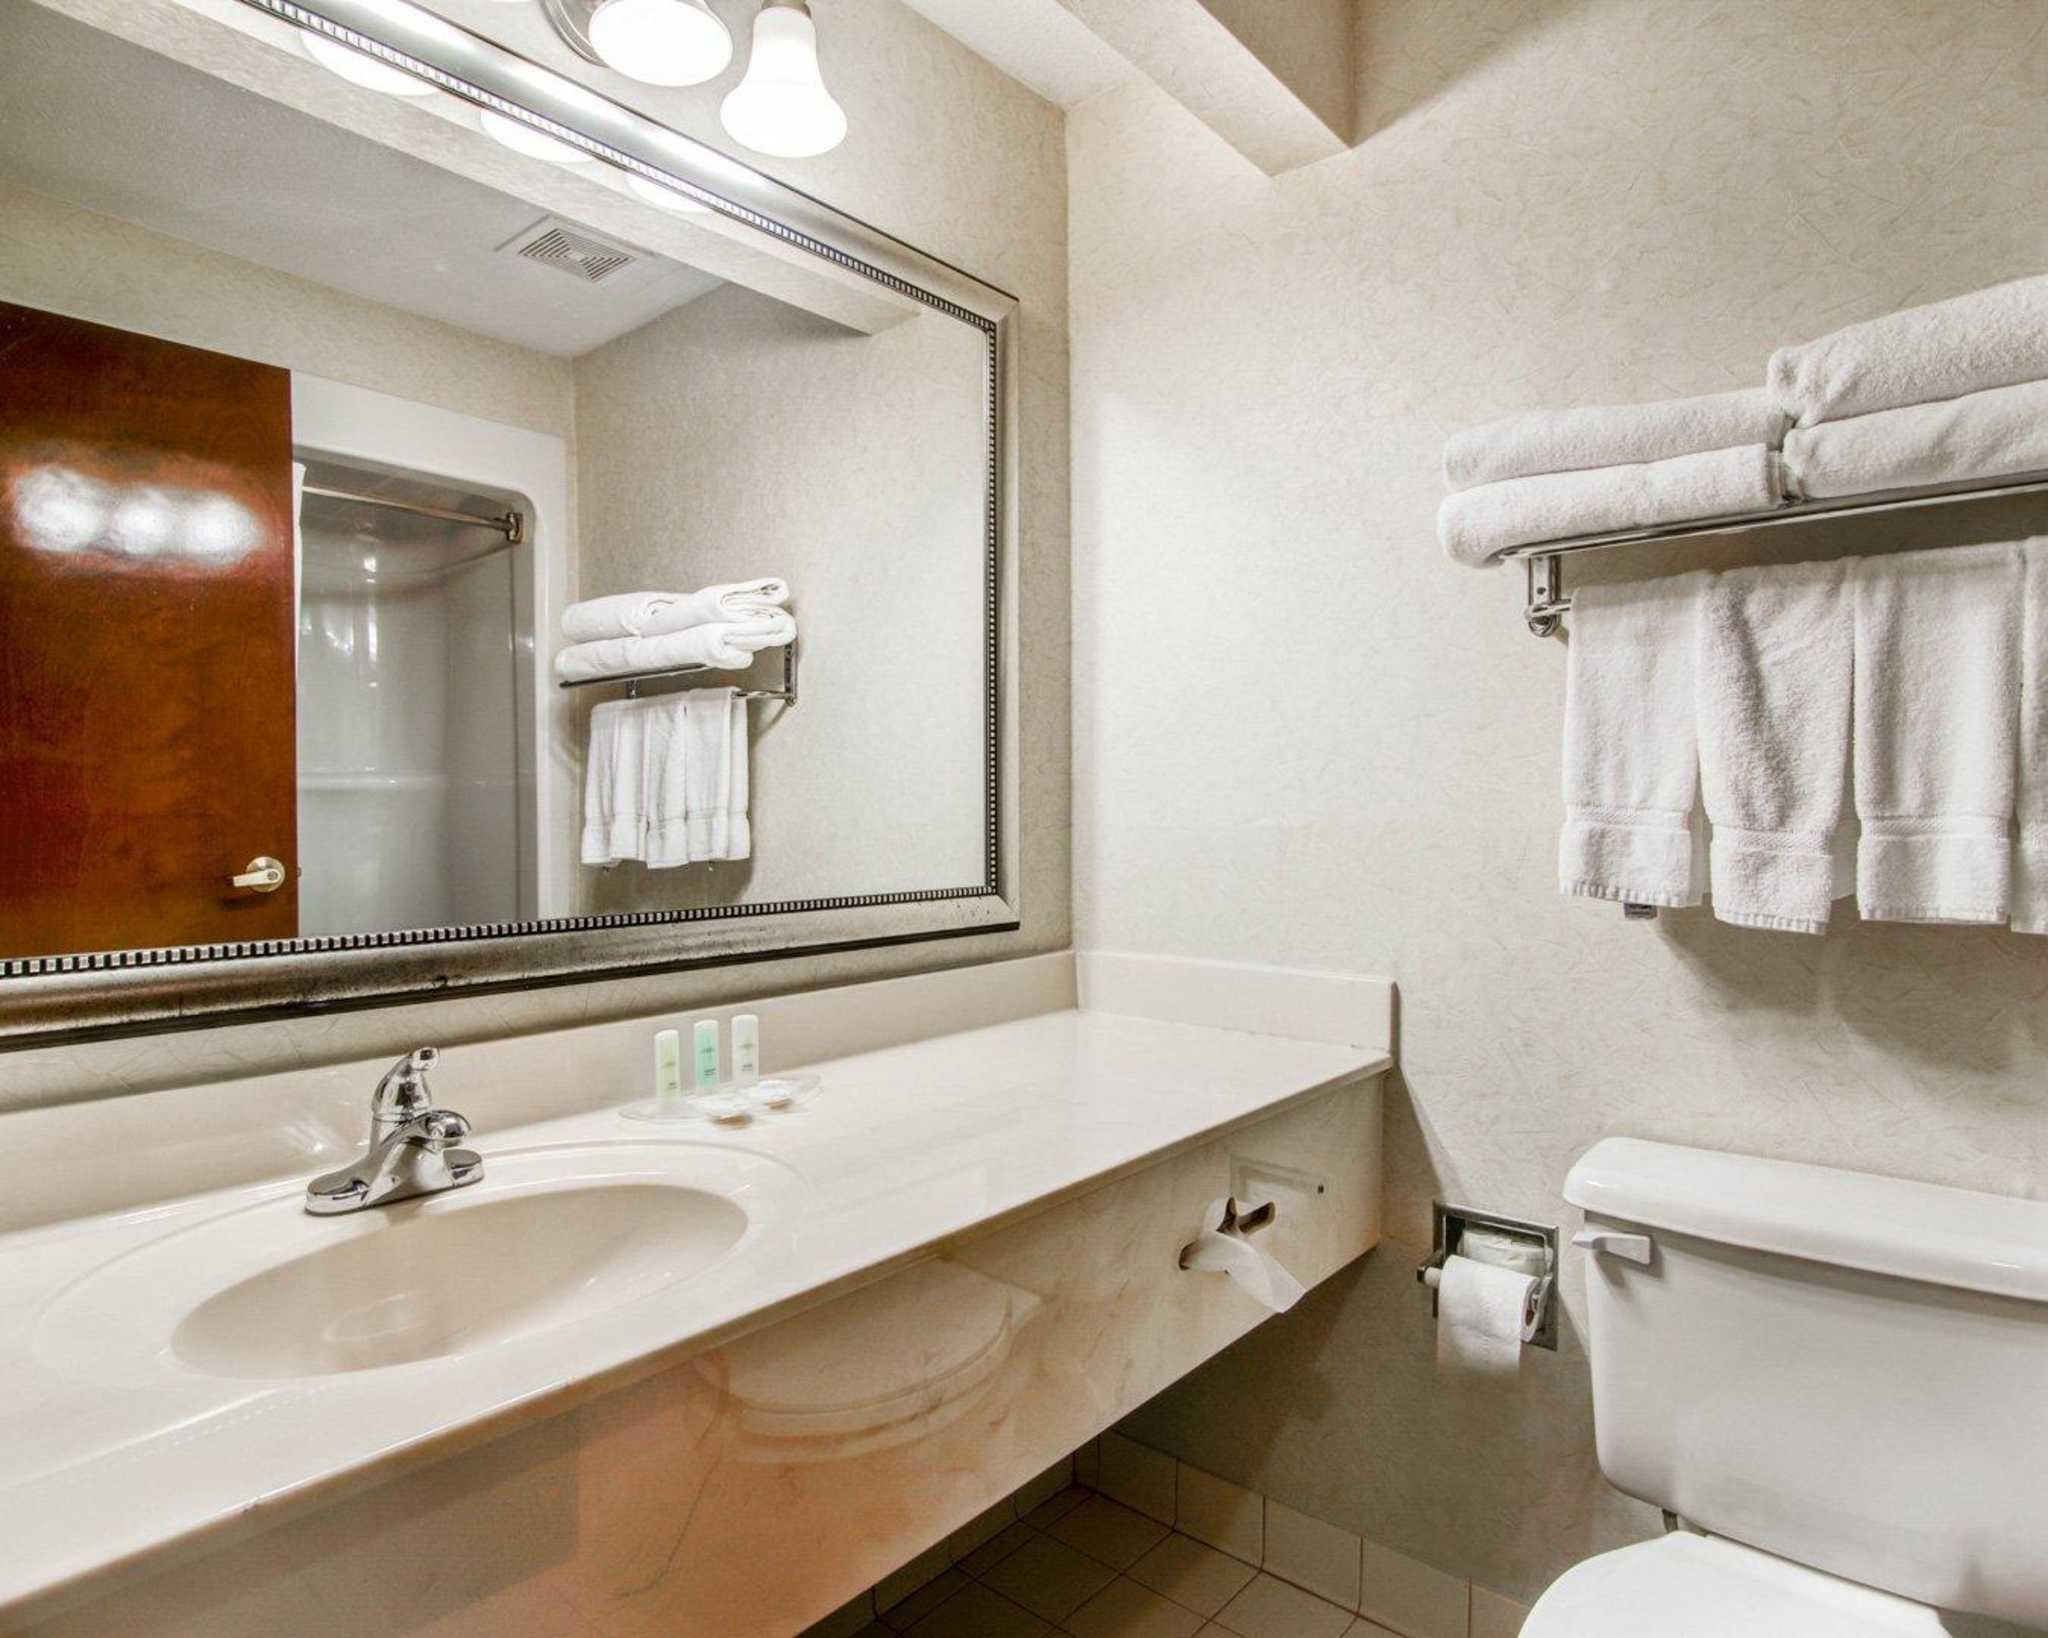 Comfort Suites image 25